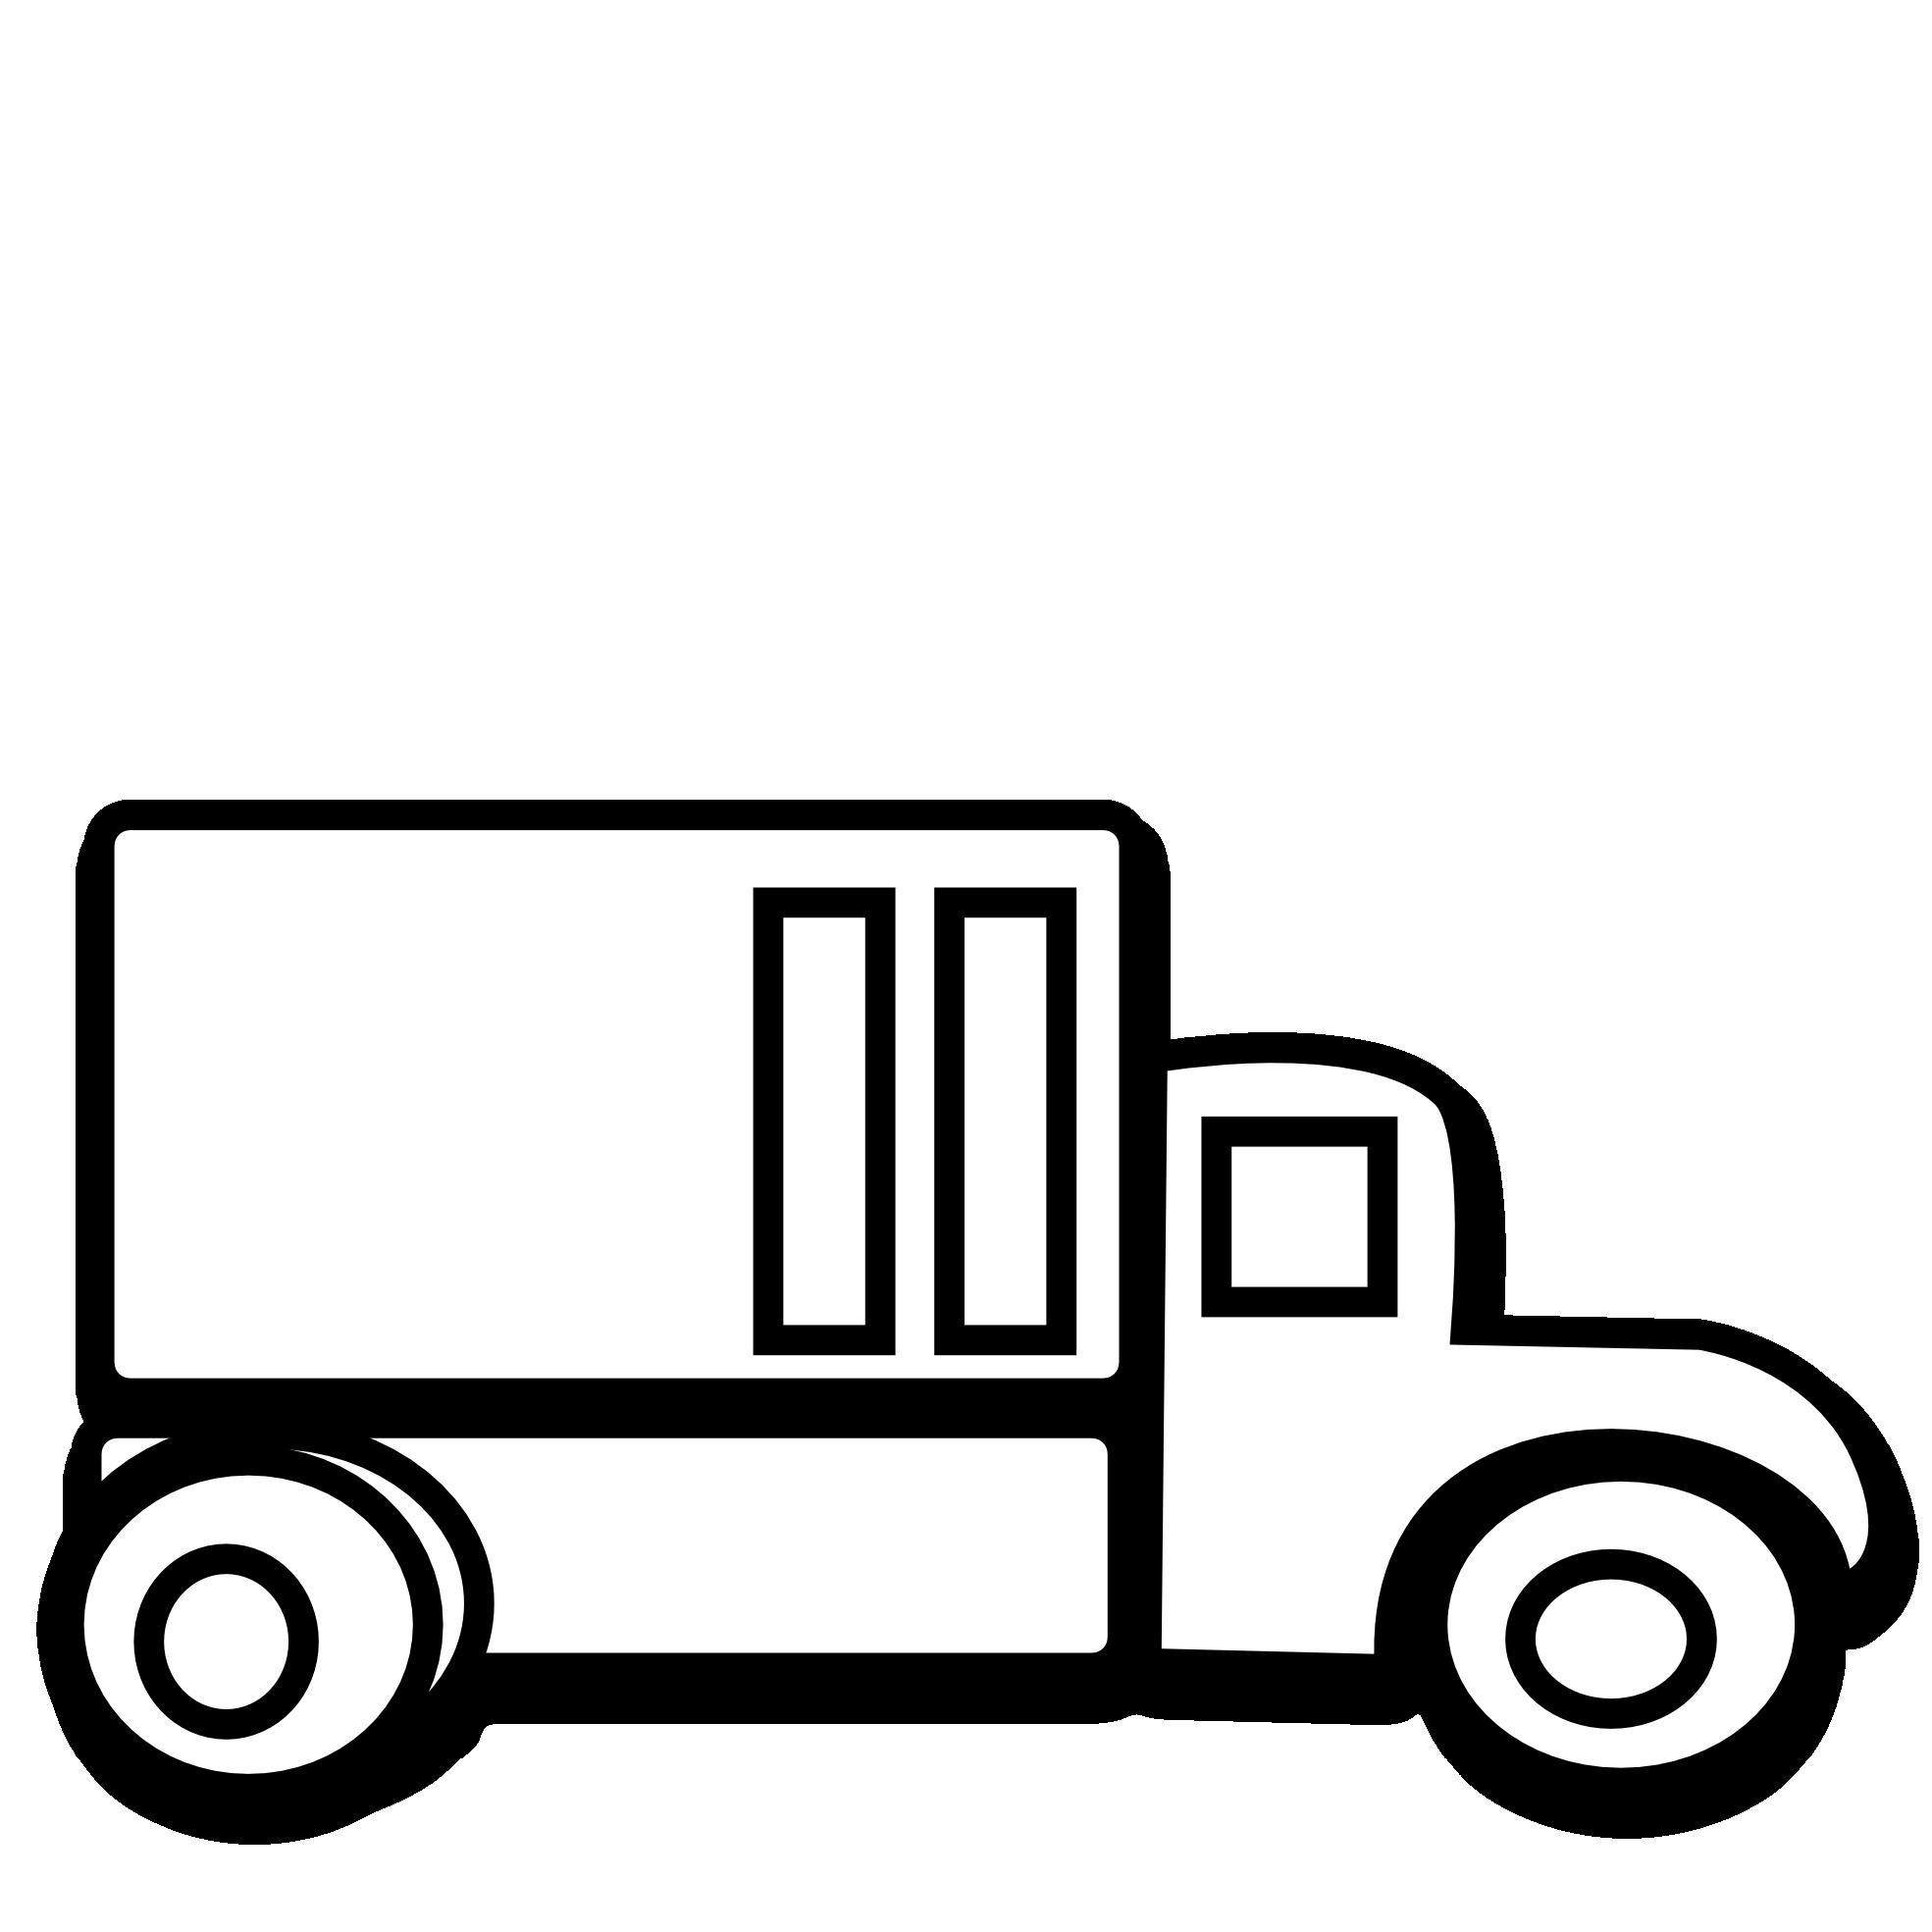 Top Fire Truck Outline Clip Art Images ~ Vector Images Design.